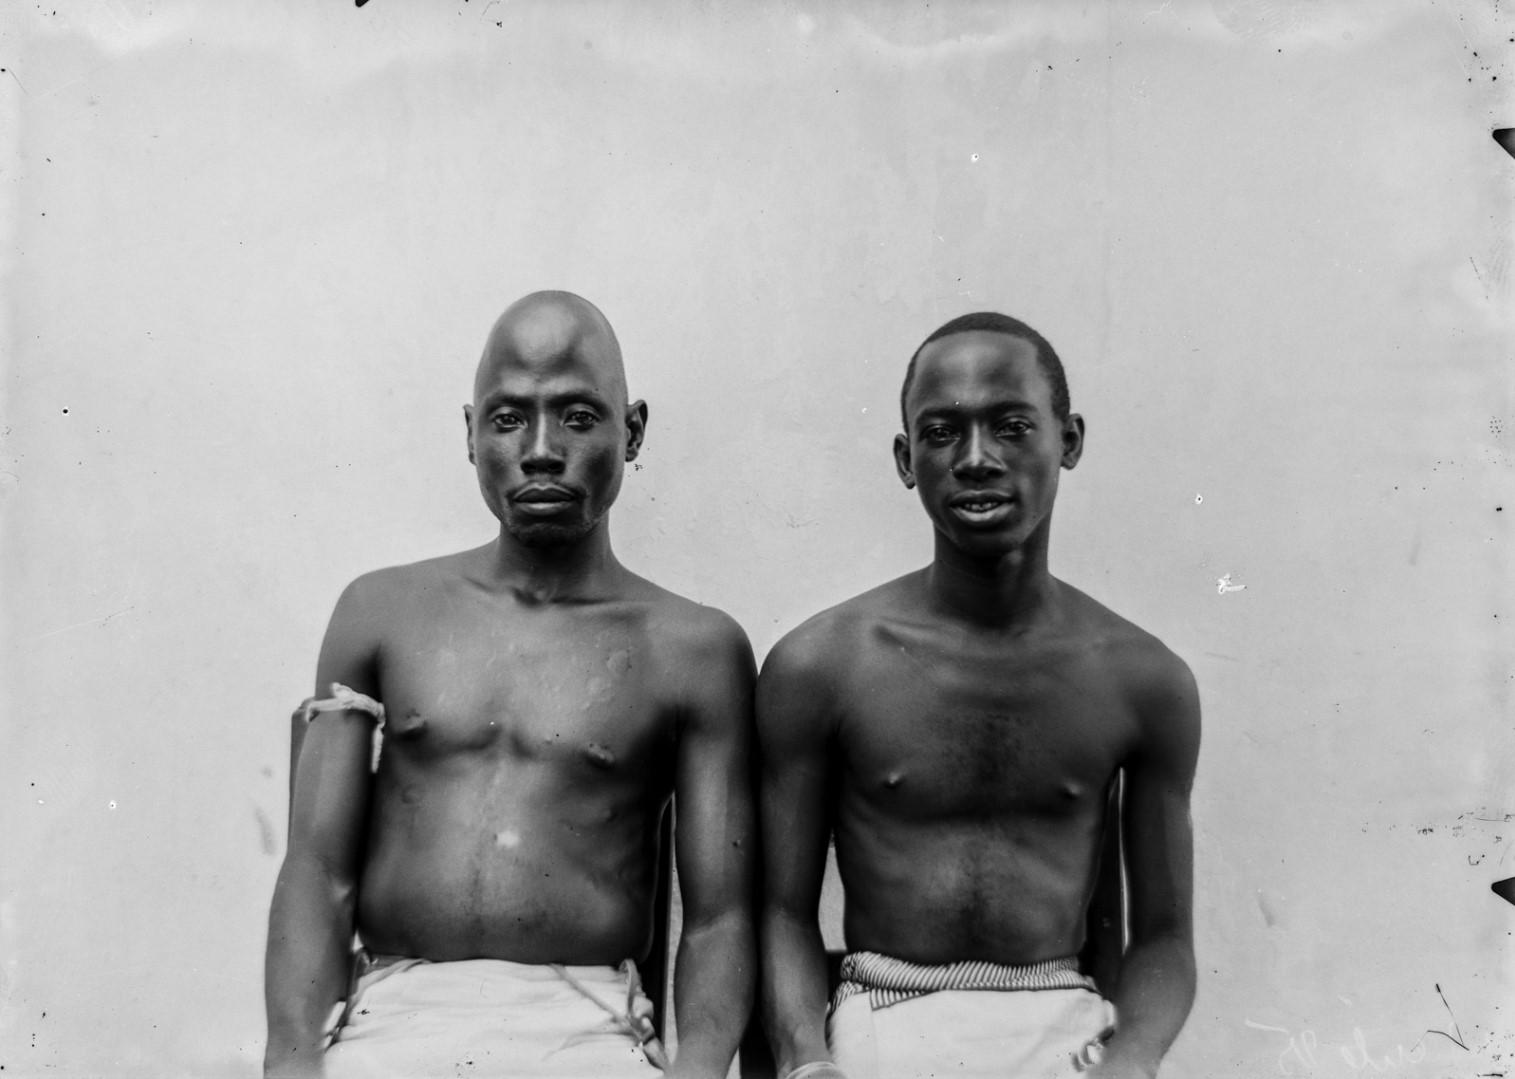 89. Портрет двух мужчин